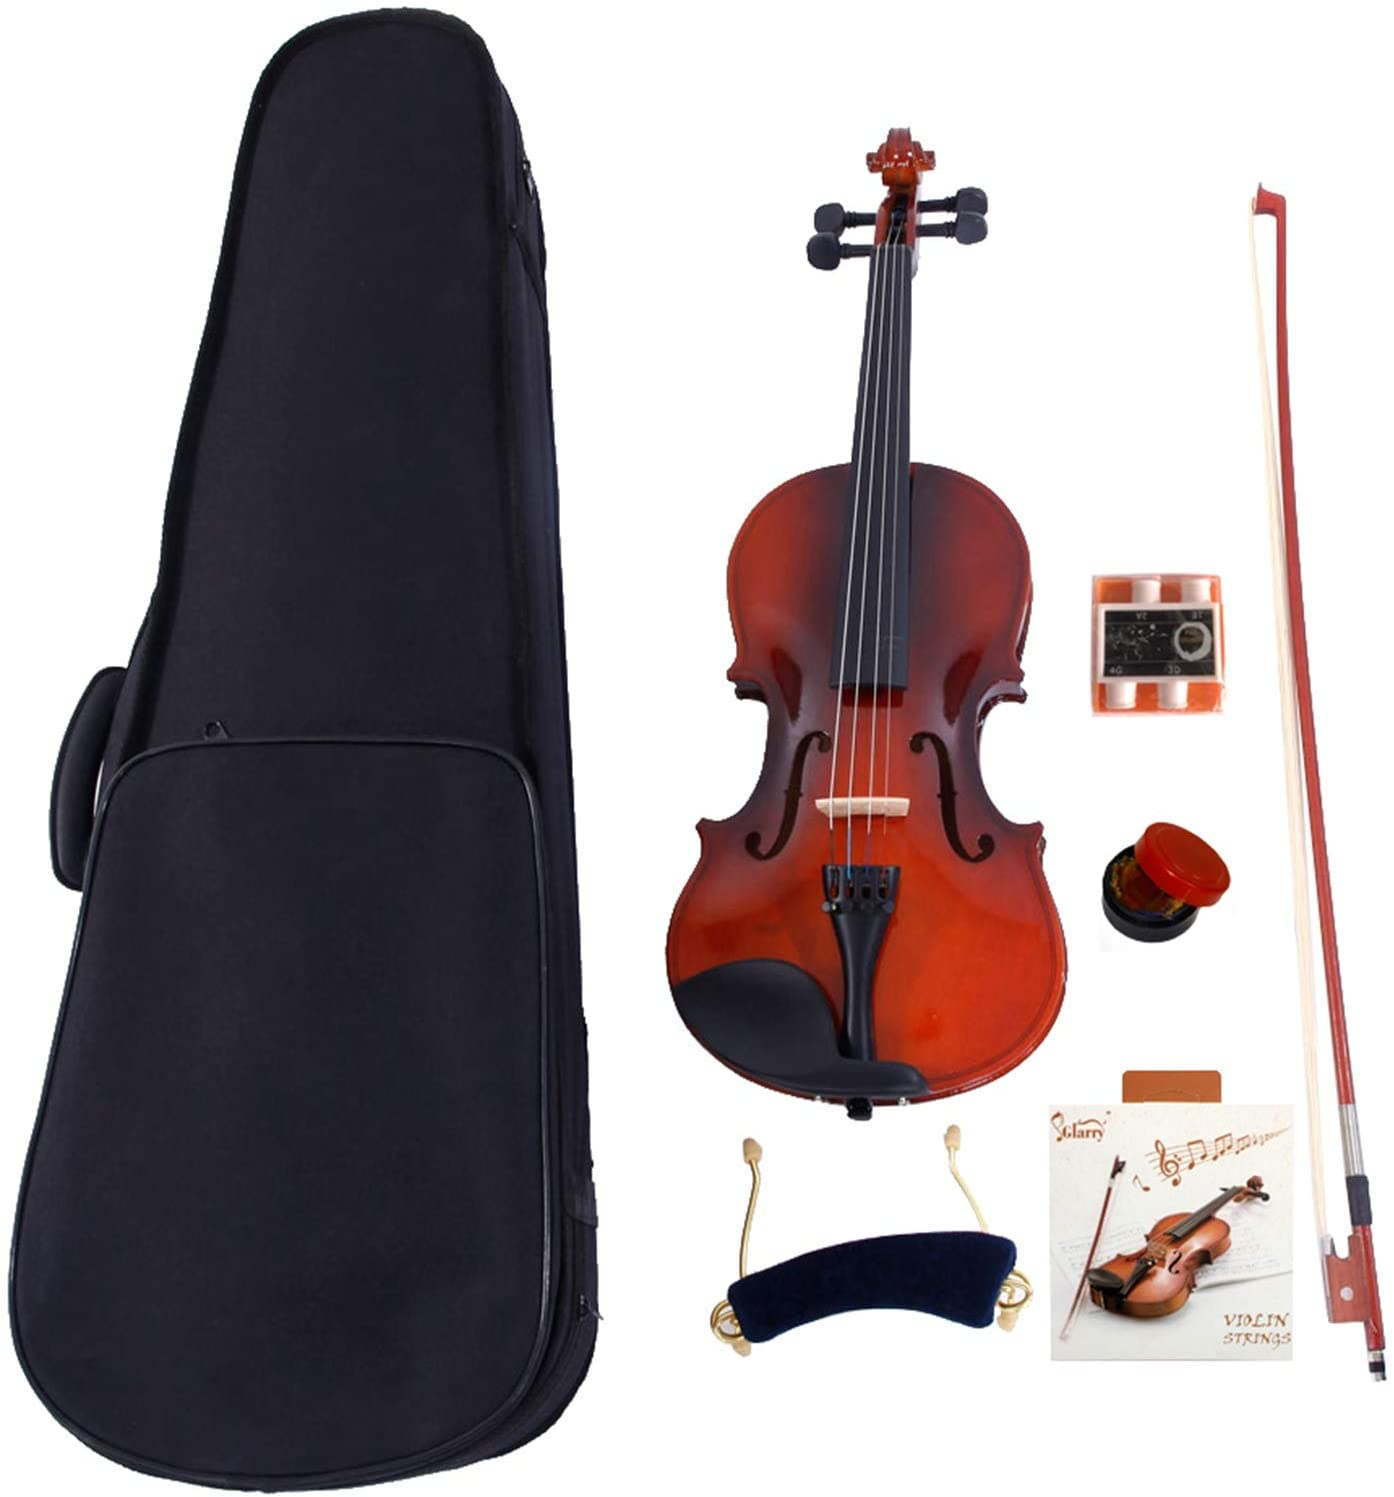 Glarry 4/4 Acoustic Violin Case Bow Rosin Strings Tuner Shoulder Rest Natural - Violin Set for Kids Beginners Students Adults